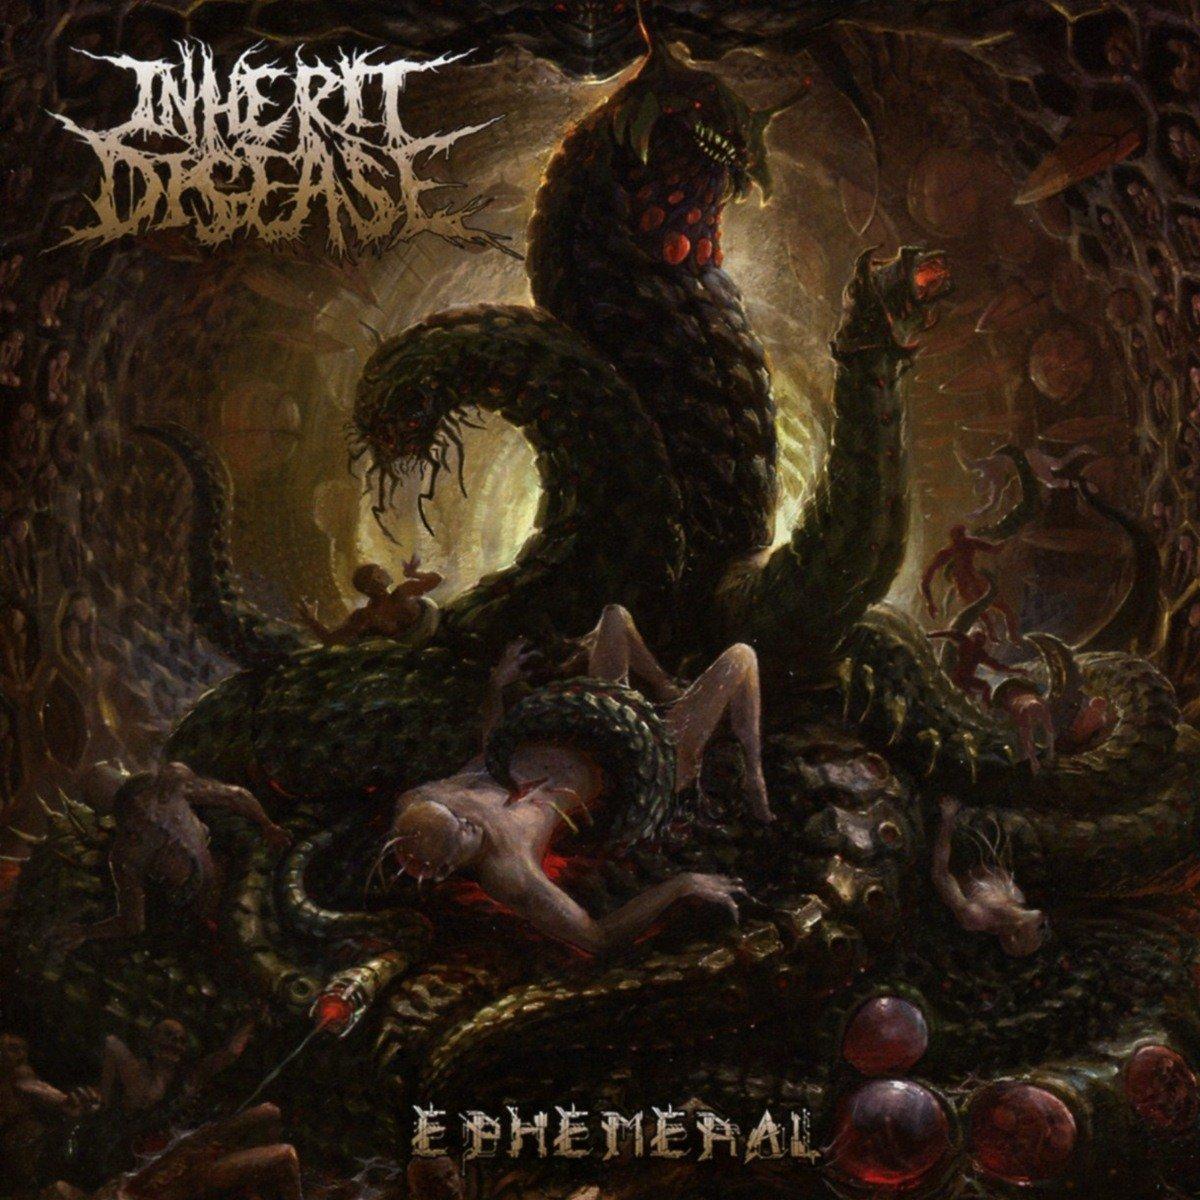 CD : INHERIT DISEASE - Ephemeral